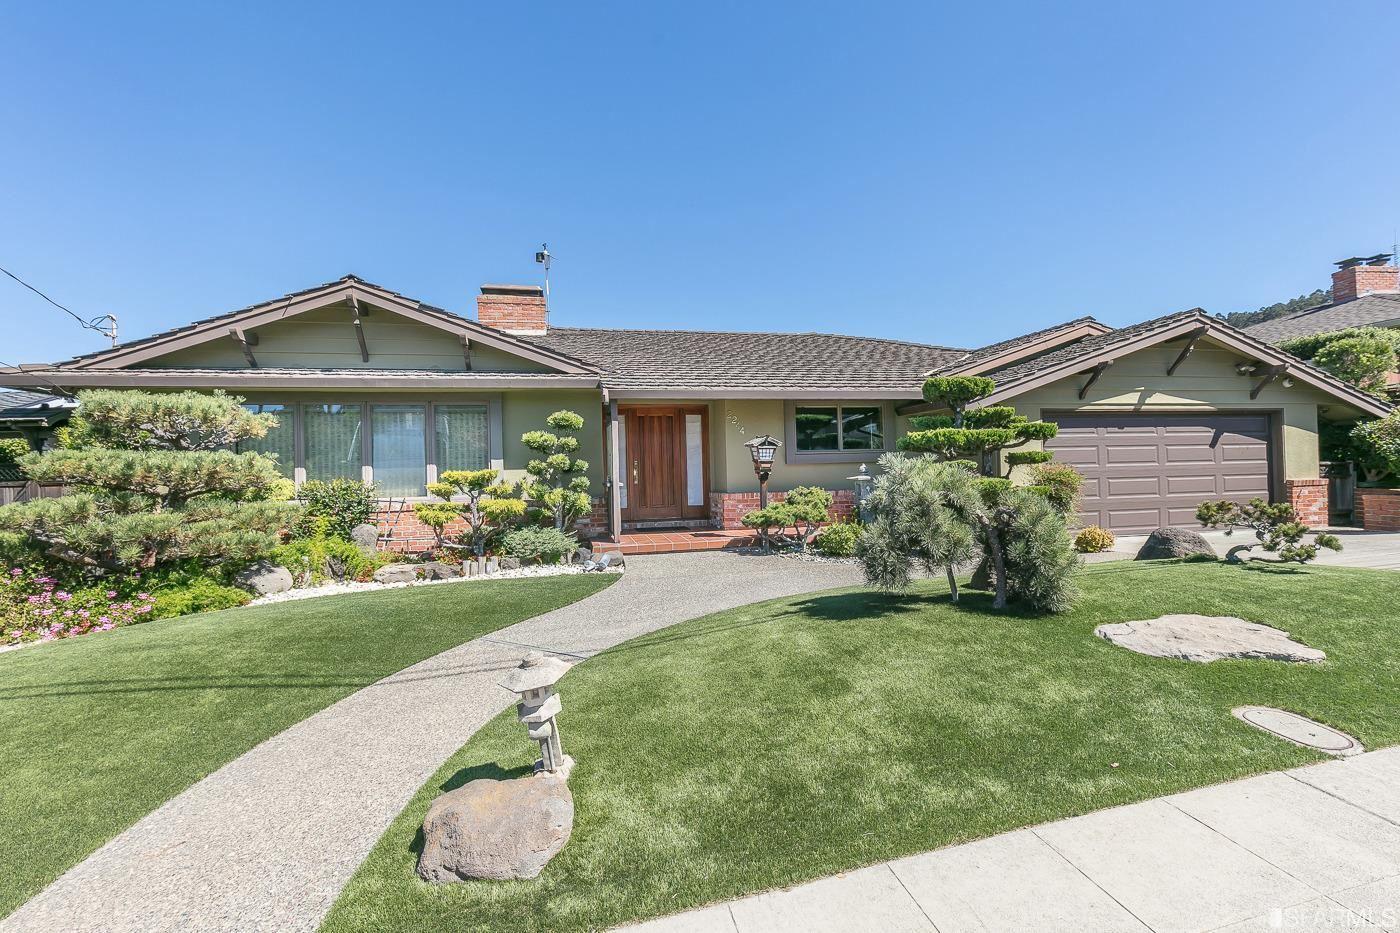 2244 Lakeview Drive, San Leandro, CA 94577 - #: 506783